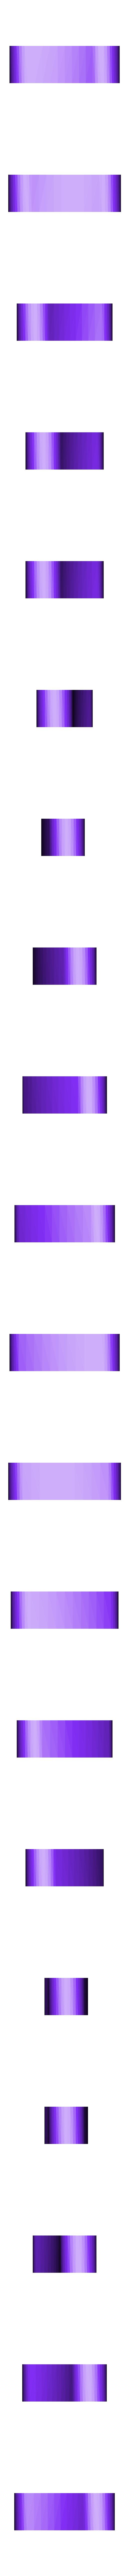 3holesBig.STL Download free STL file CurvedLinks: Large size circular links (LEGO Compatible) • 3D printing template, byucmr